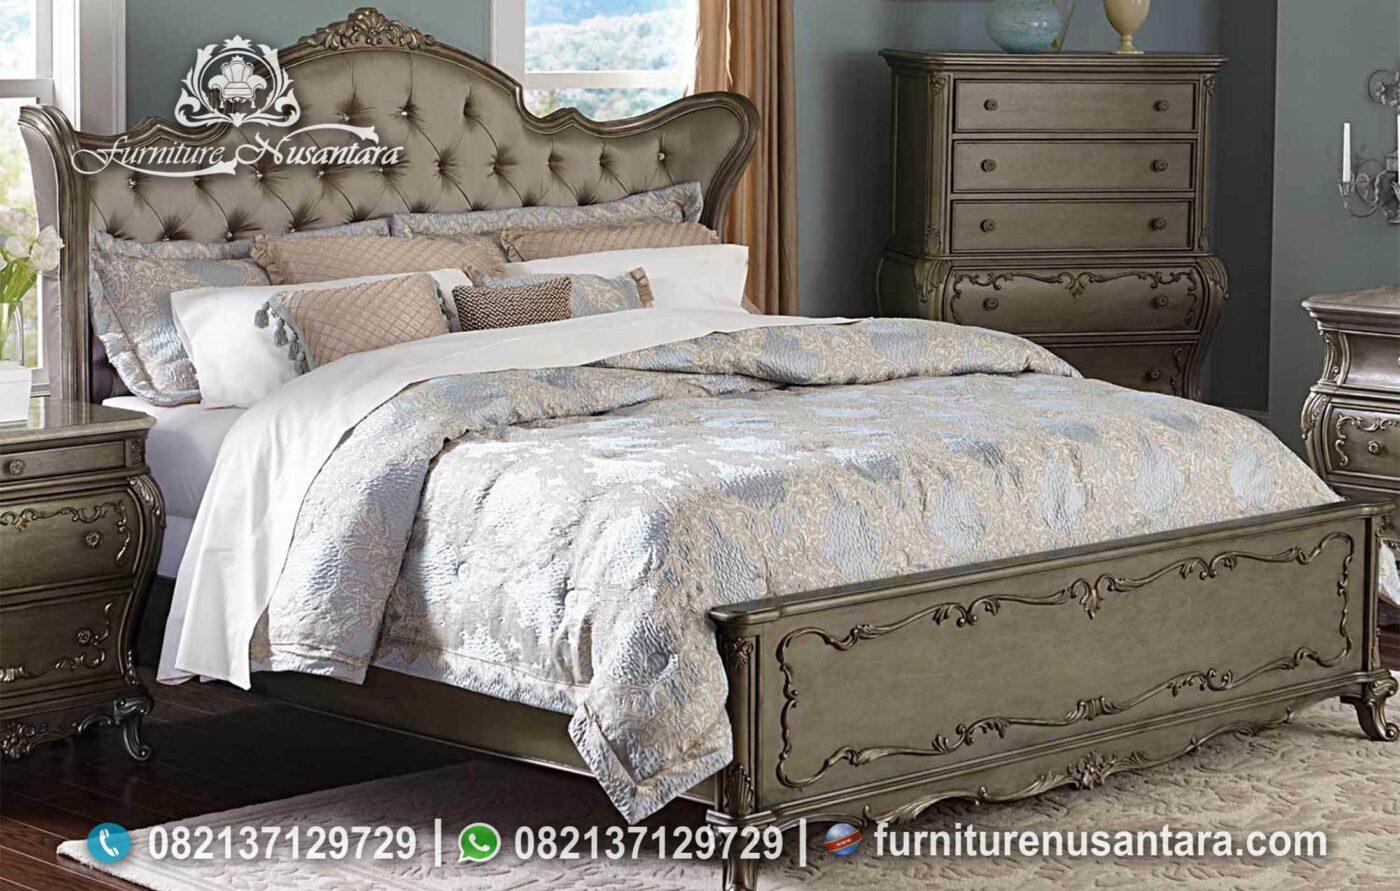 Jual Tempat Tidur Sederhana Termurah KS-244, Furniture Nusantara